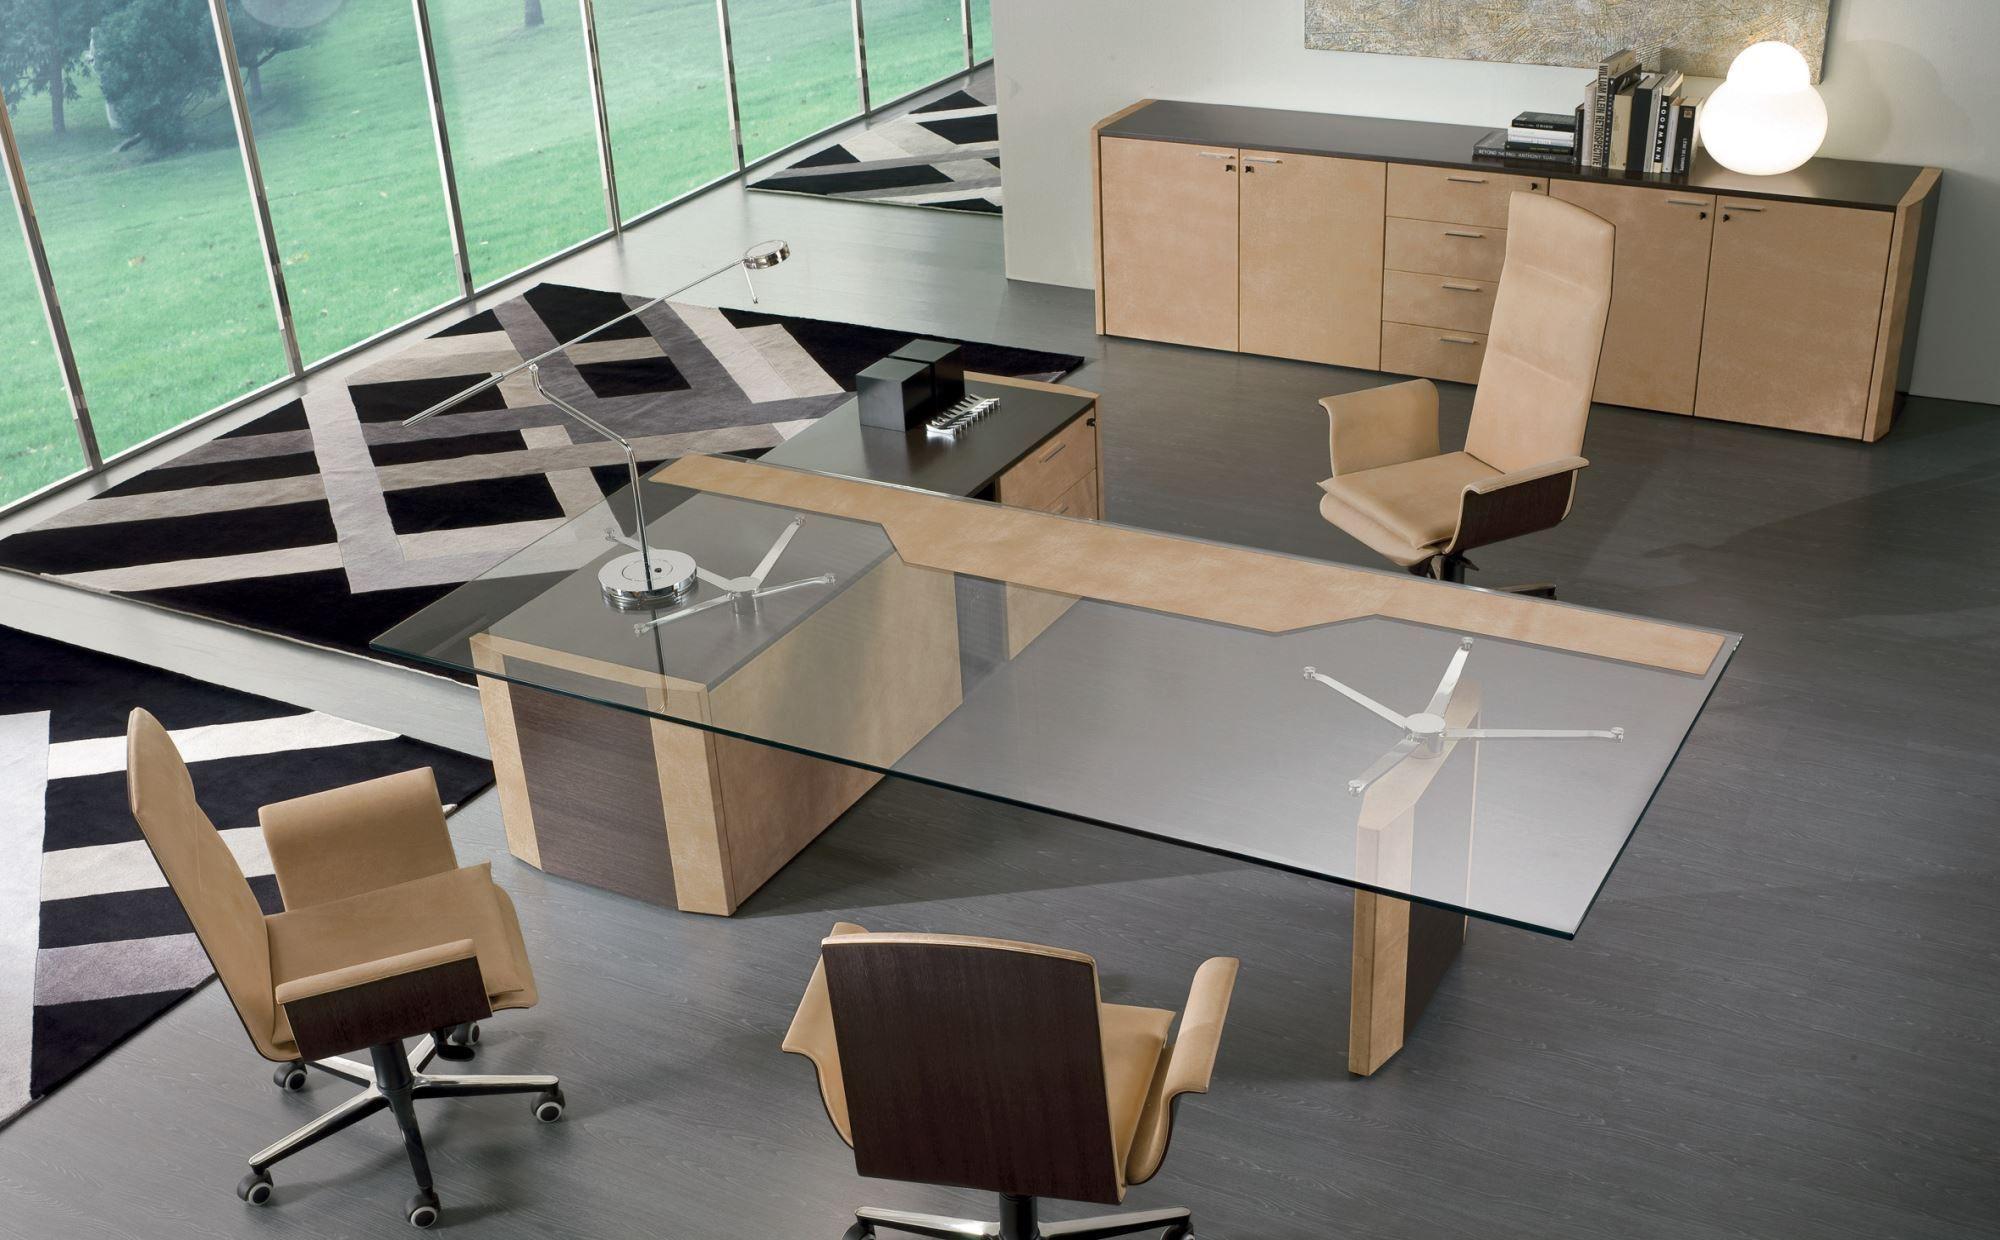 Escritorios Modernos De Madera Y Vidrio Buscar Con Google Office Furniture Design Office Design Office Furniture